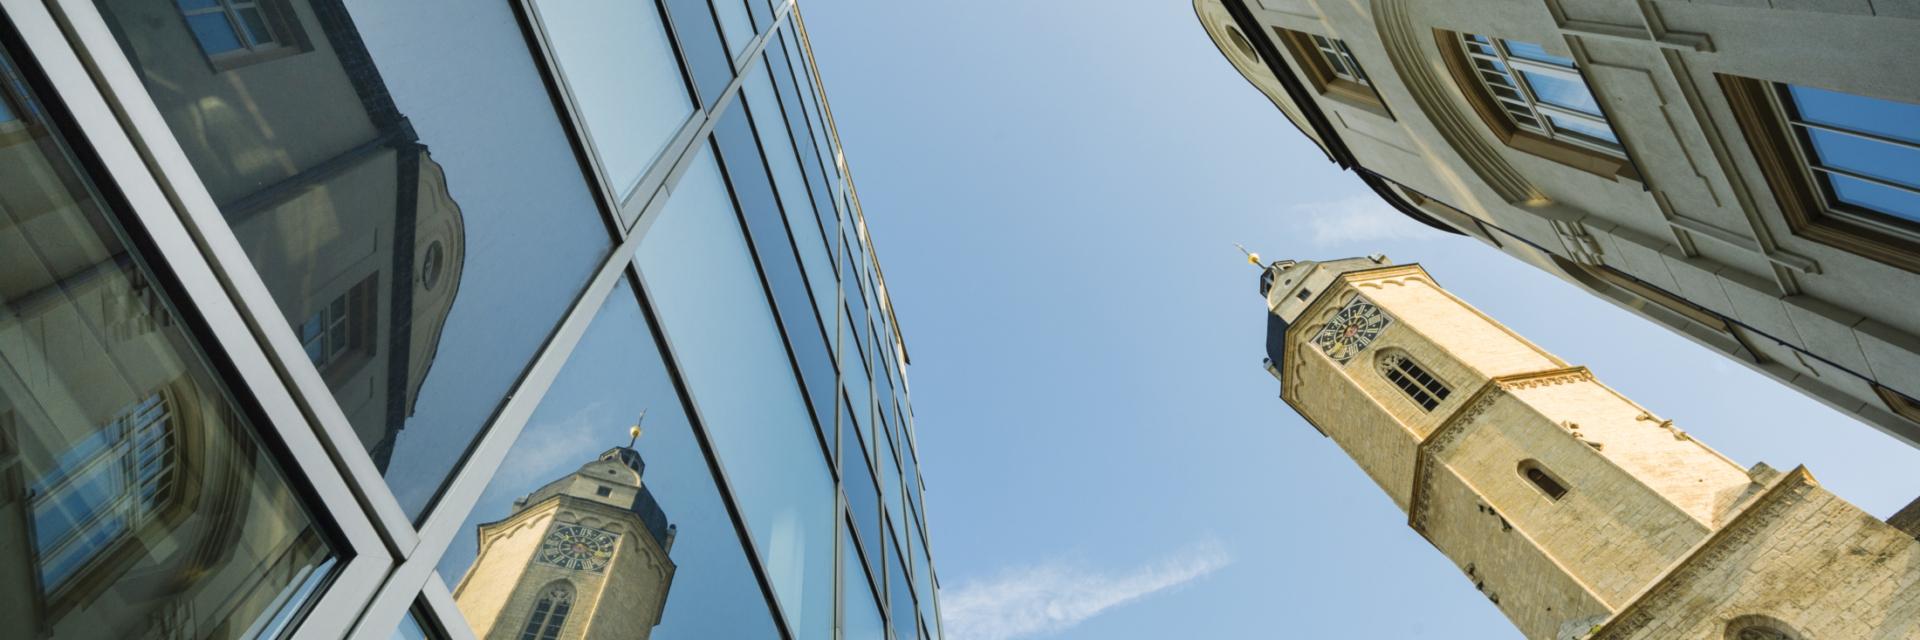 Himmelsblick auf Jenaer Gebäude und dem Turm der Stadtkirche St. Michael - Rahmenprogramme in Jena © JenaKultur, Foto: Andreas Hub